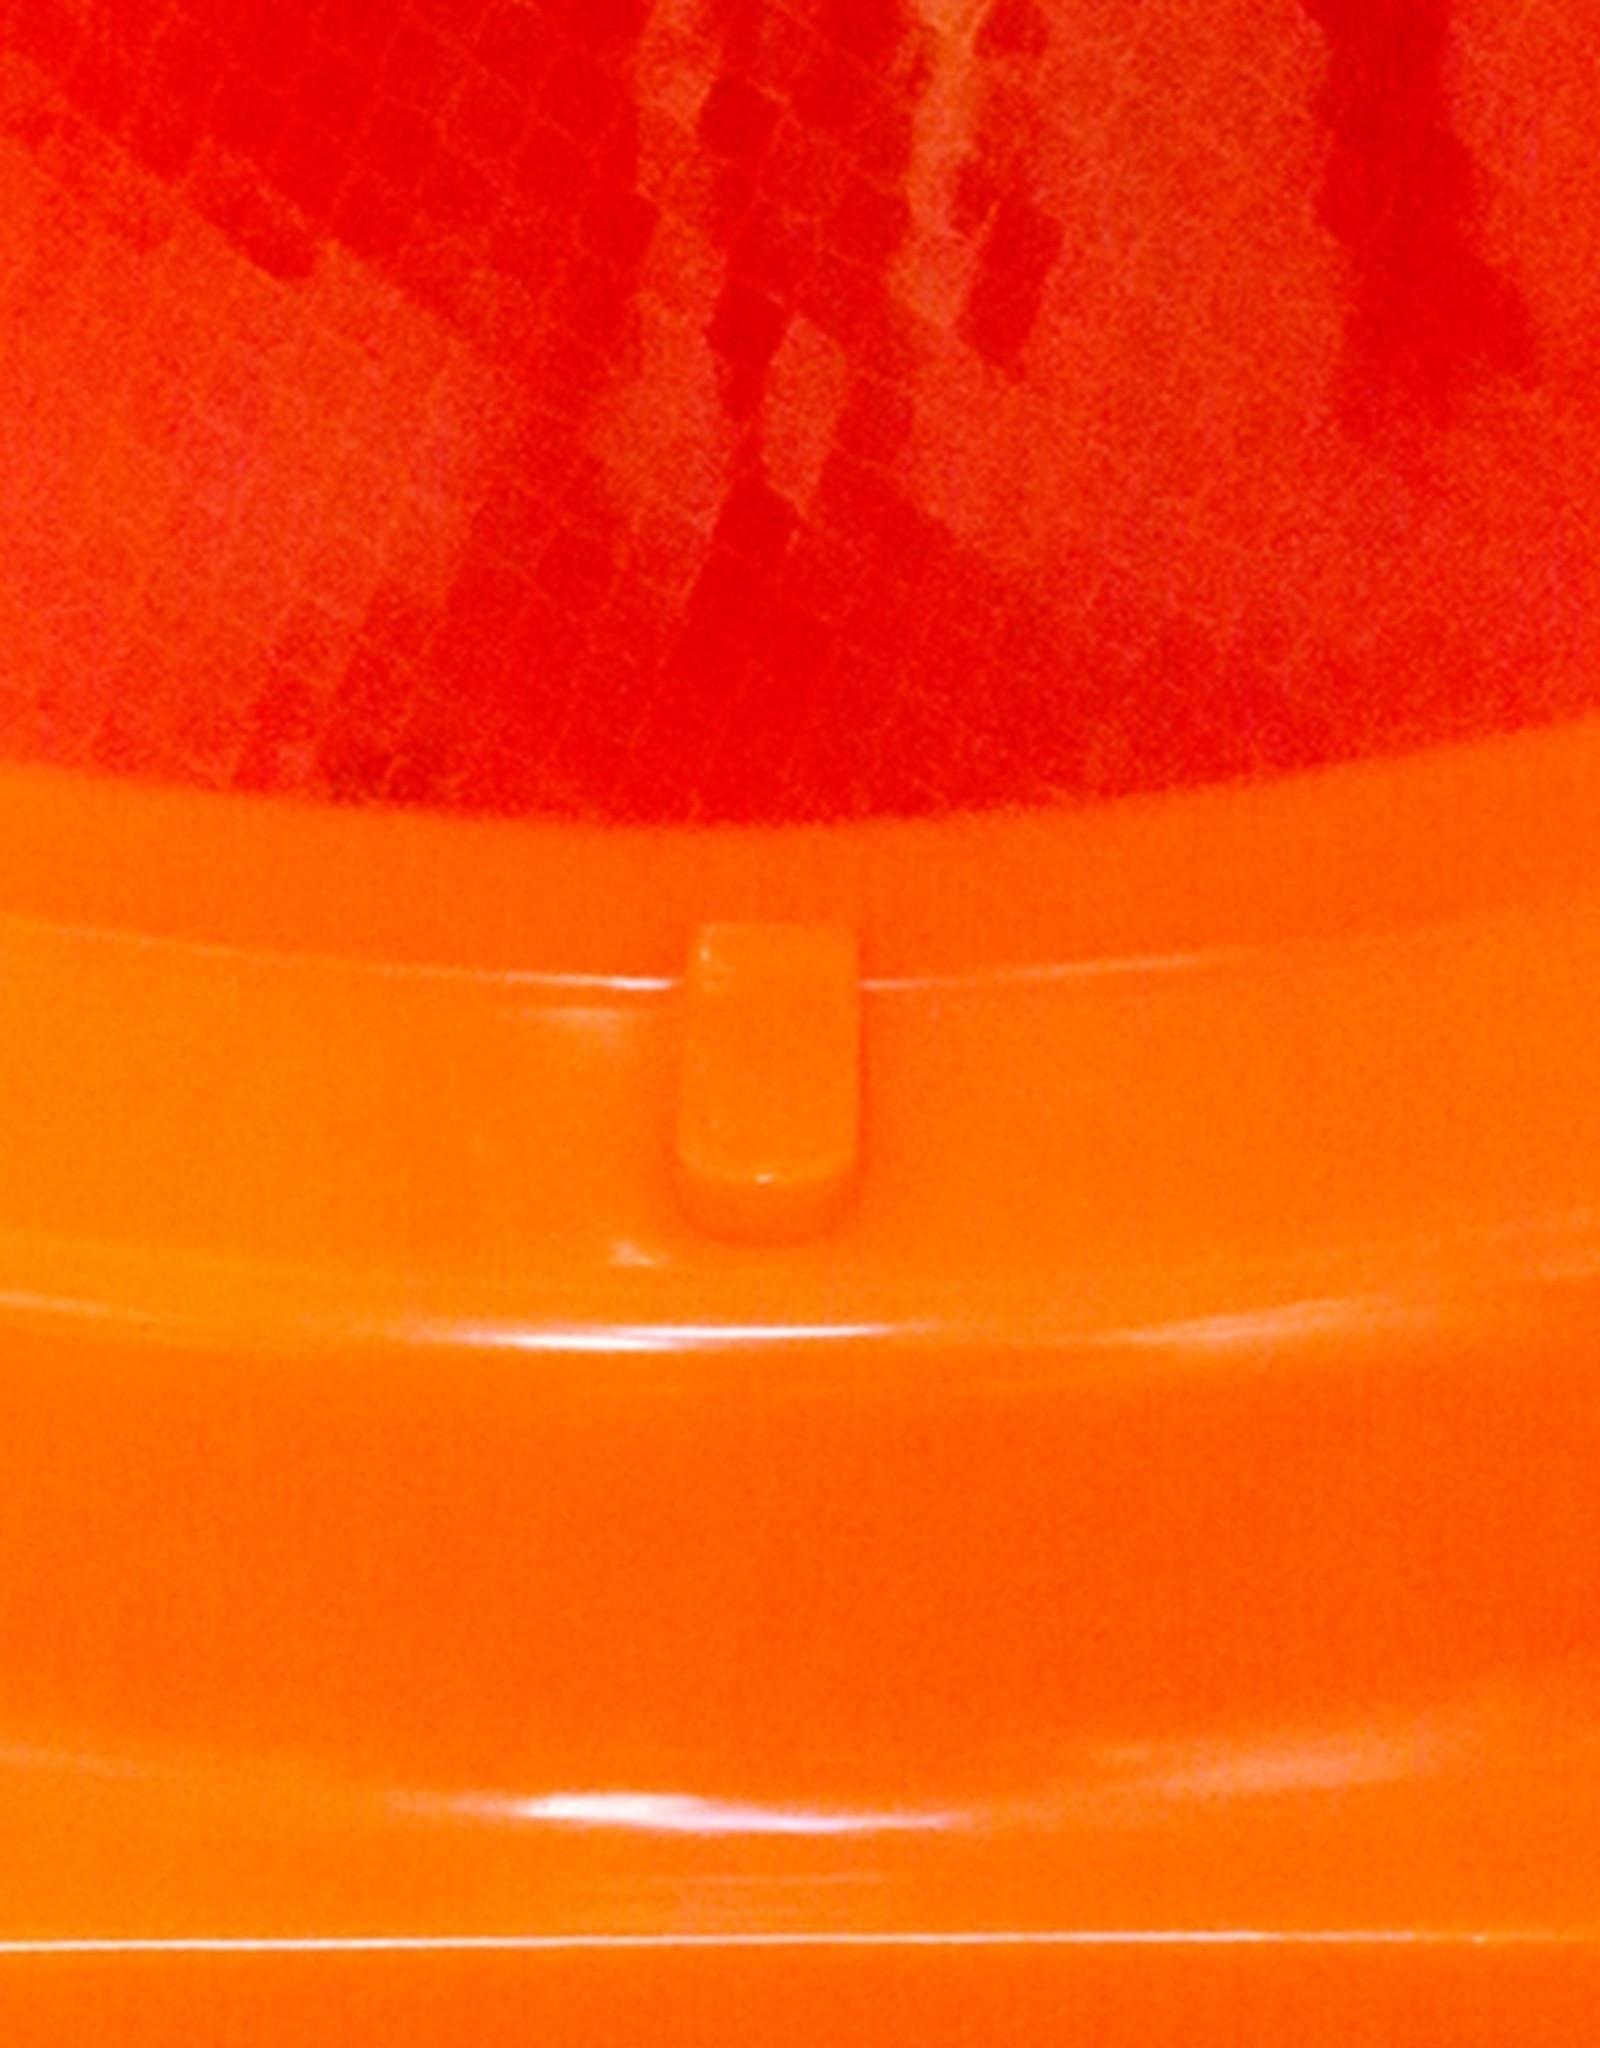 Molan | Eendelige verkeerskegel 75cm hoog, klasse 2 folie, reflecterend